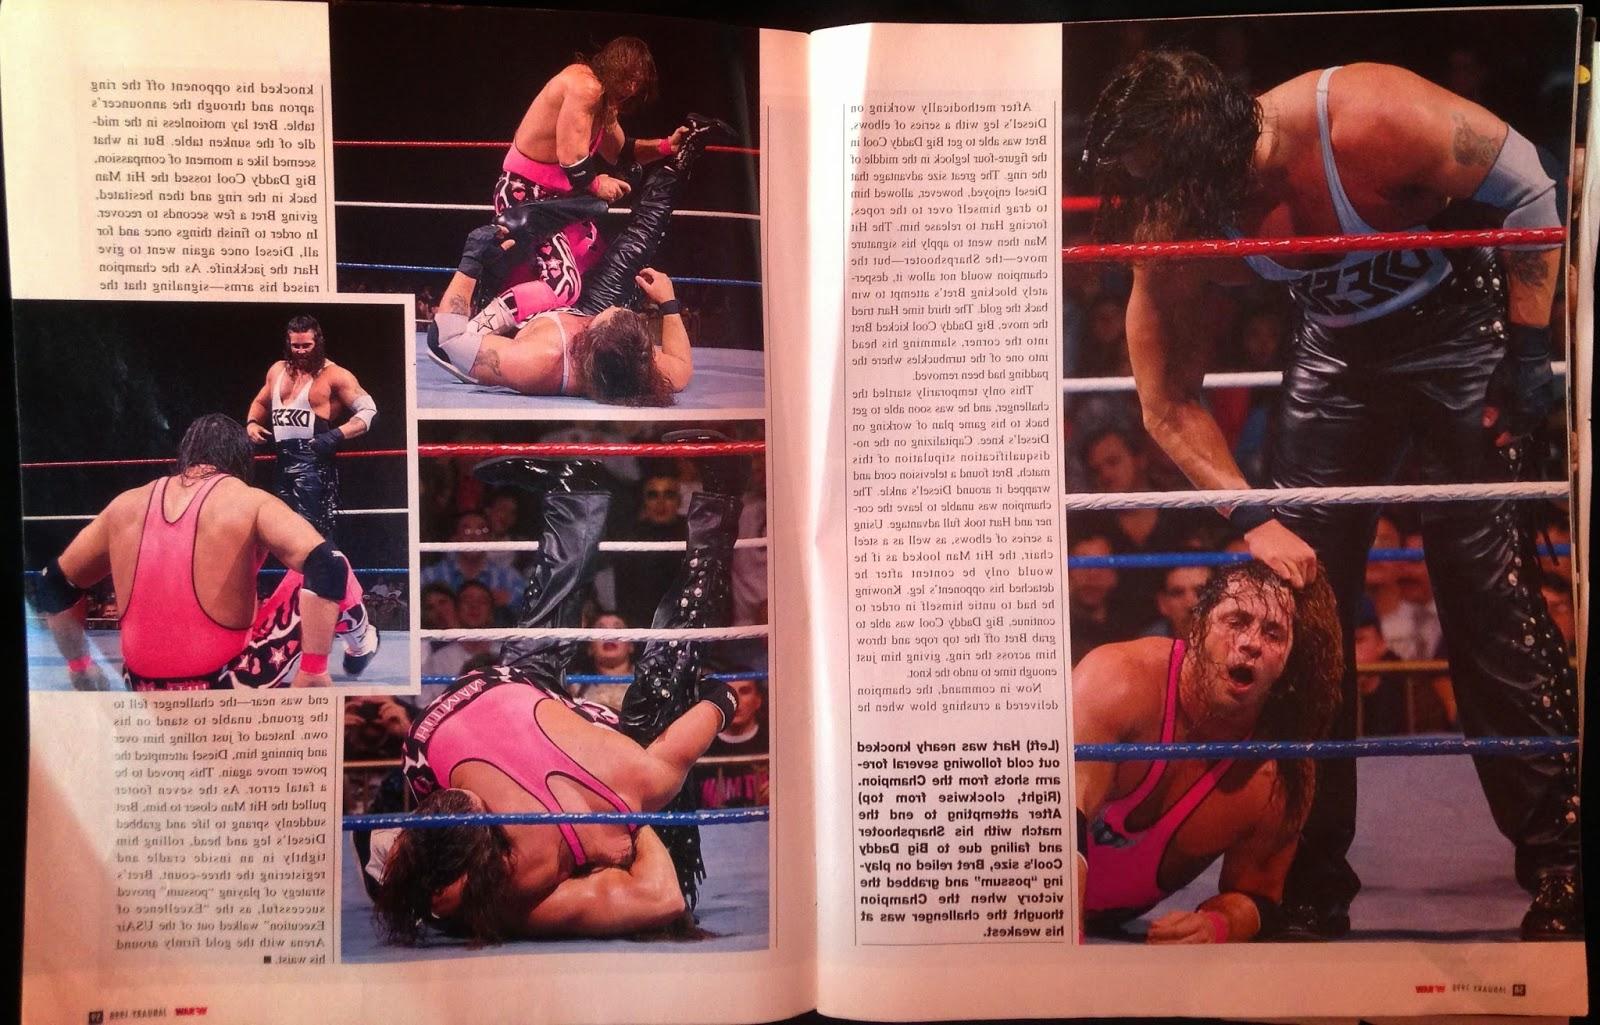 WWE: WWF RAW MAGAZINE - January 1998 - More Bret Hart vs. Diesel coverage